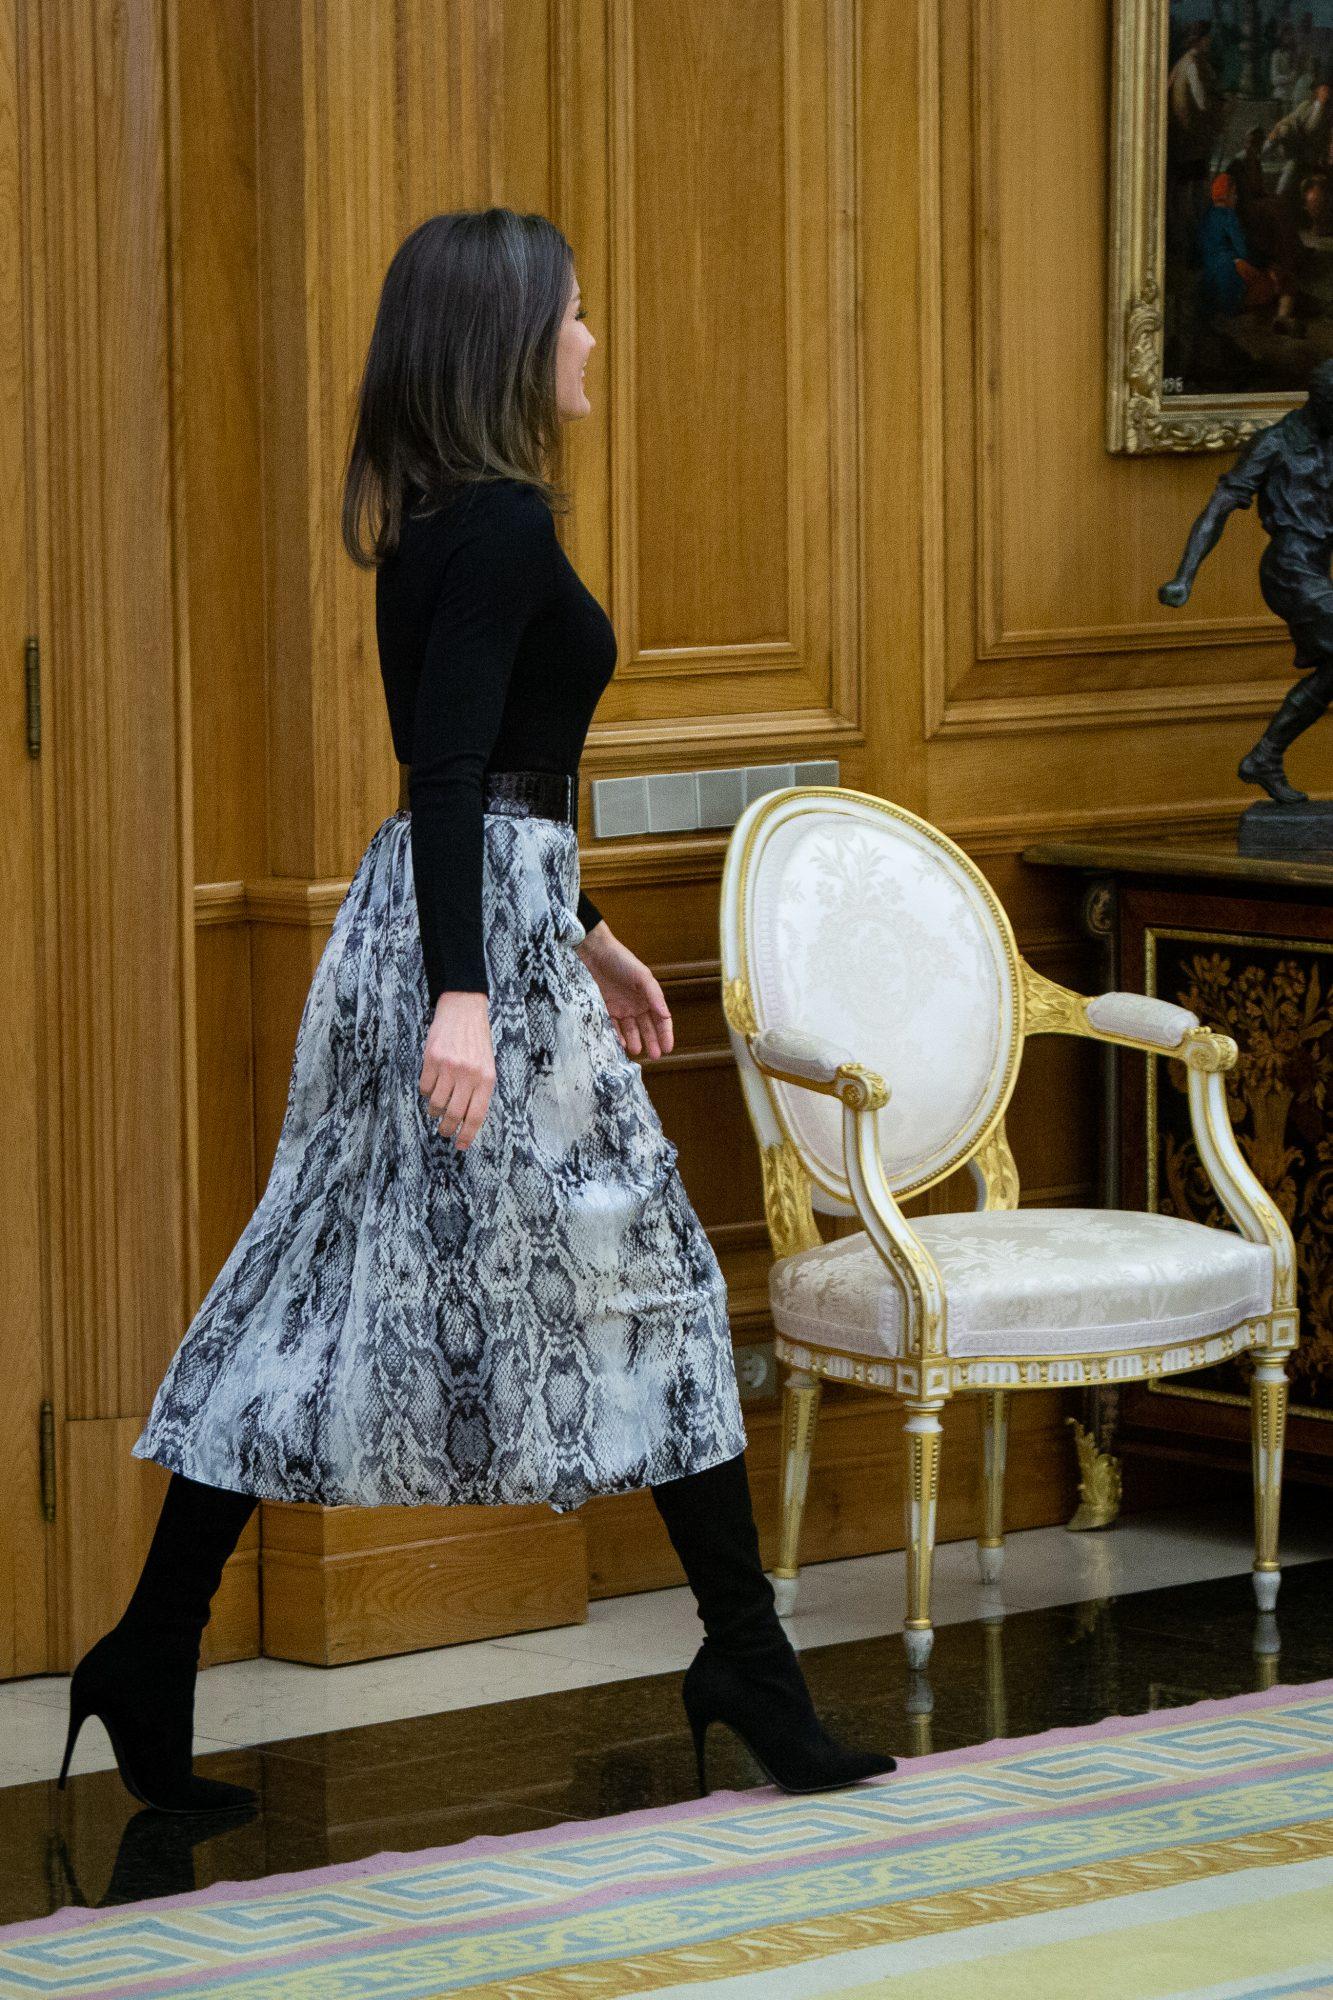 reina Letizia, estilo, falda, zara, barata, low cost, rebajas, falda plisada, ootd